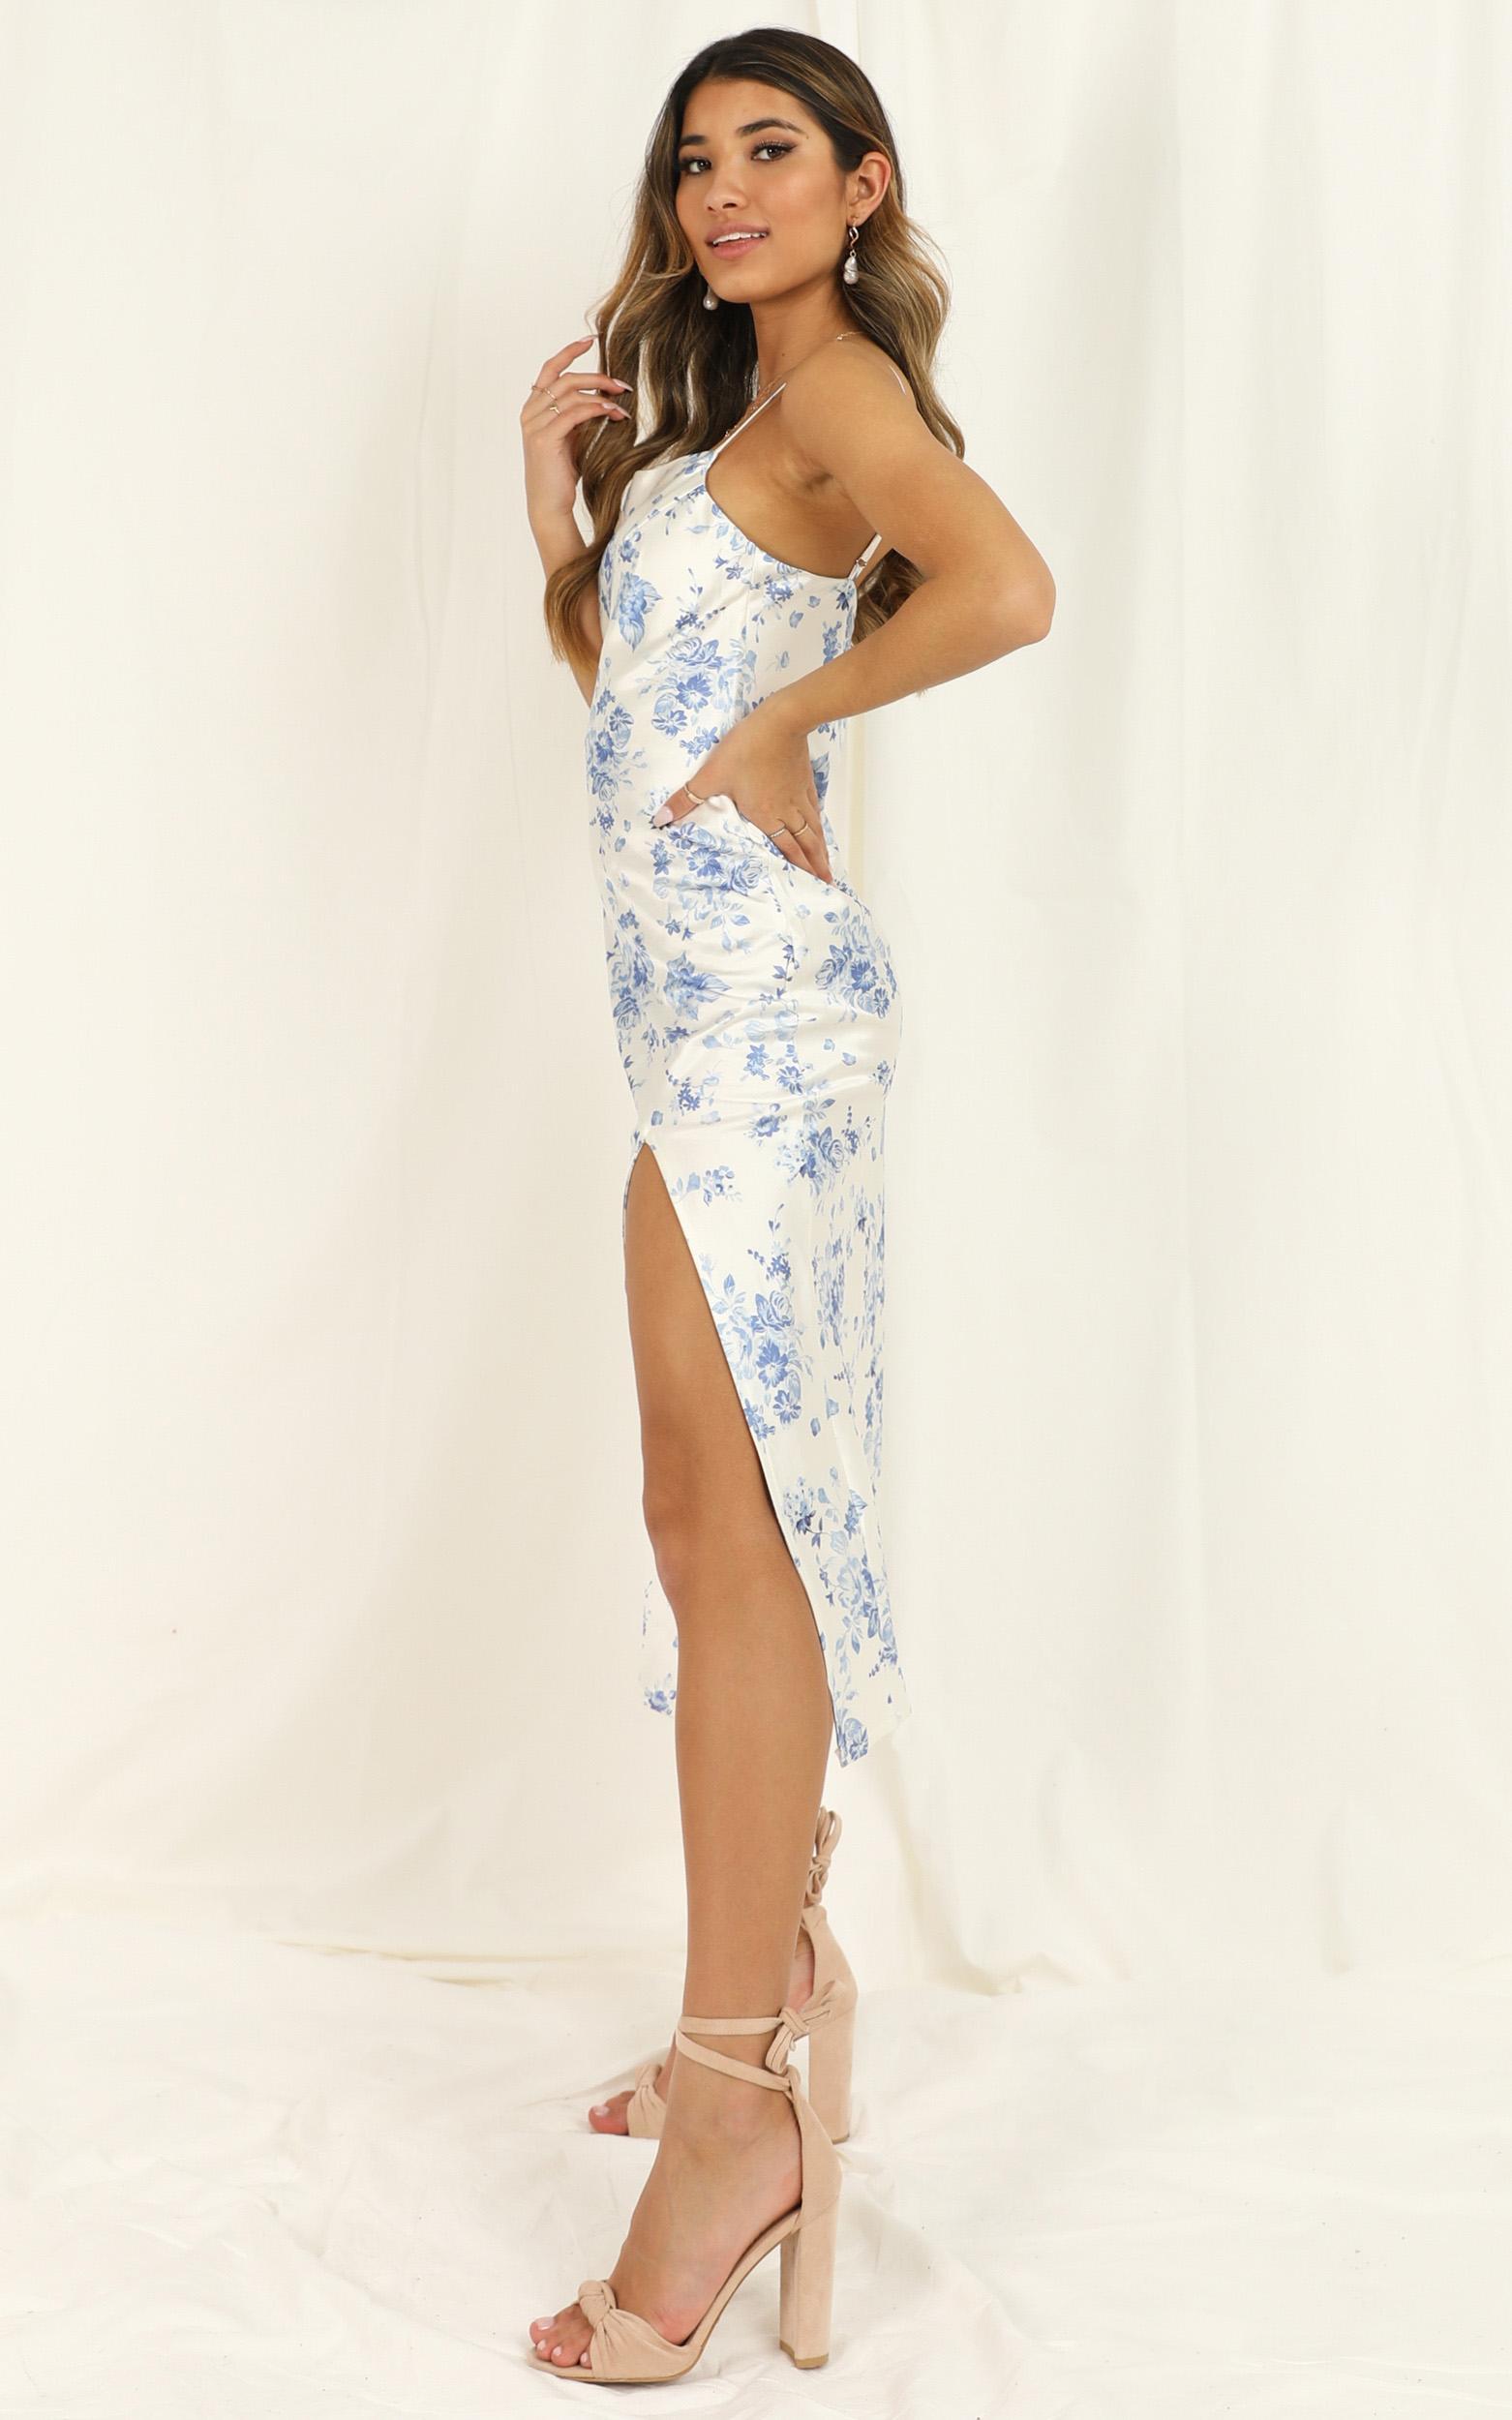 Minimizing Risk dress in white floral satin - 12 (L), White, hi-res image number null